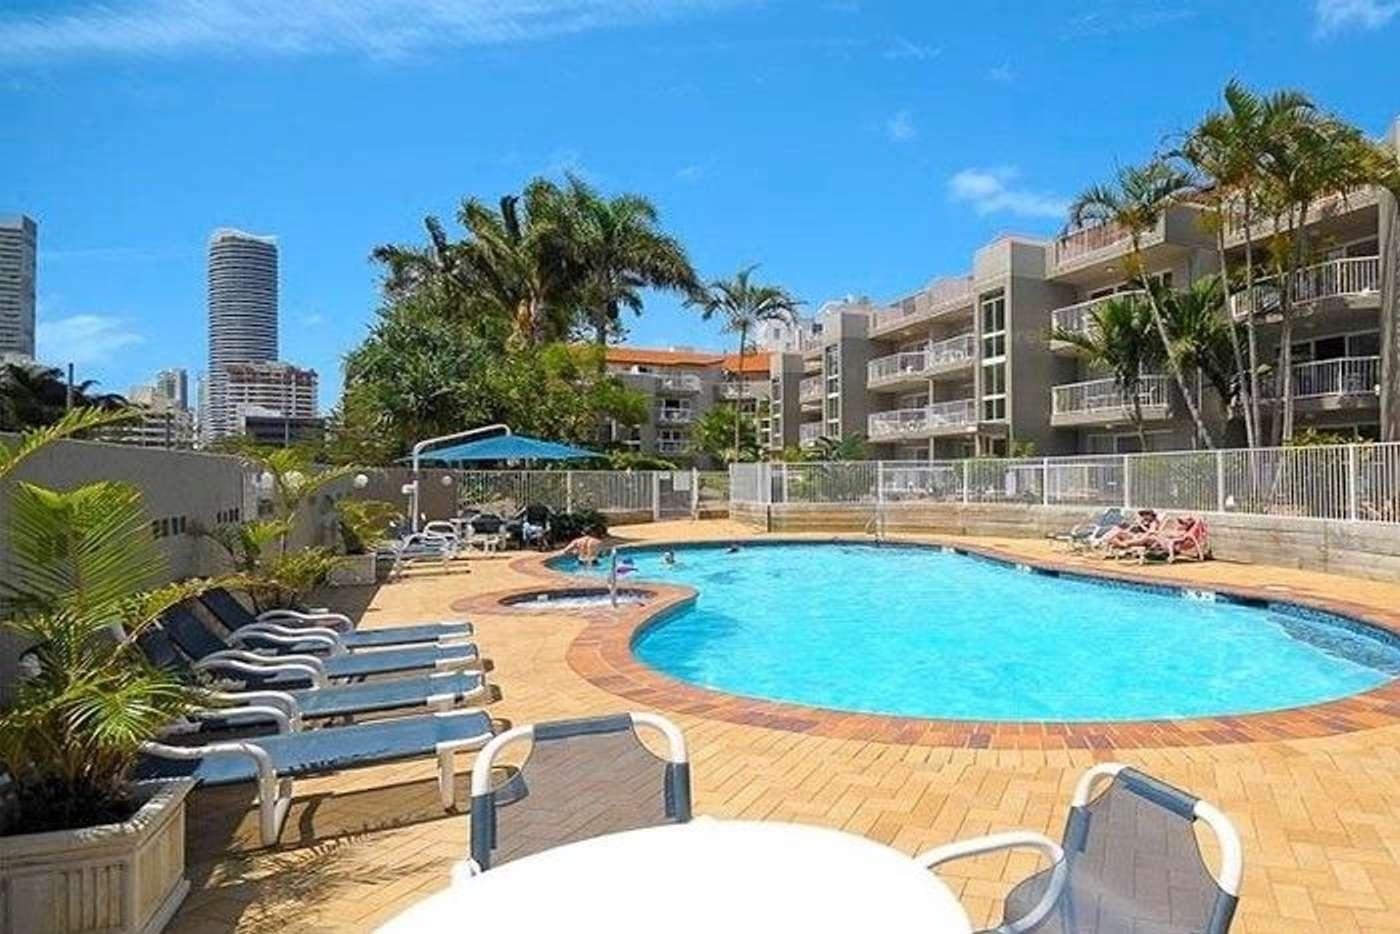 Main view of Homely unit listing, 21/36 Australia Avenue, Broadbeach QLD 4218